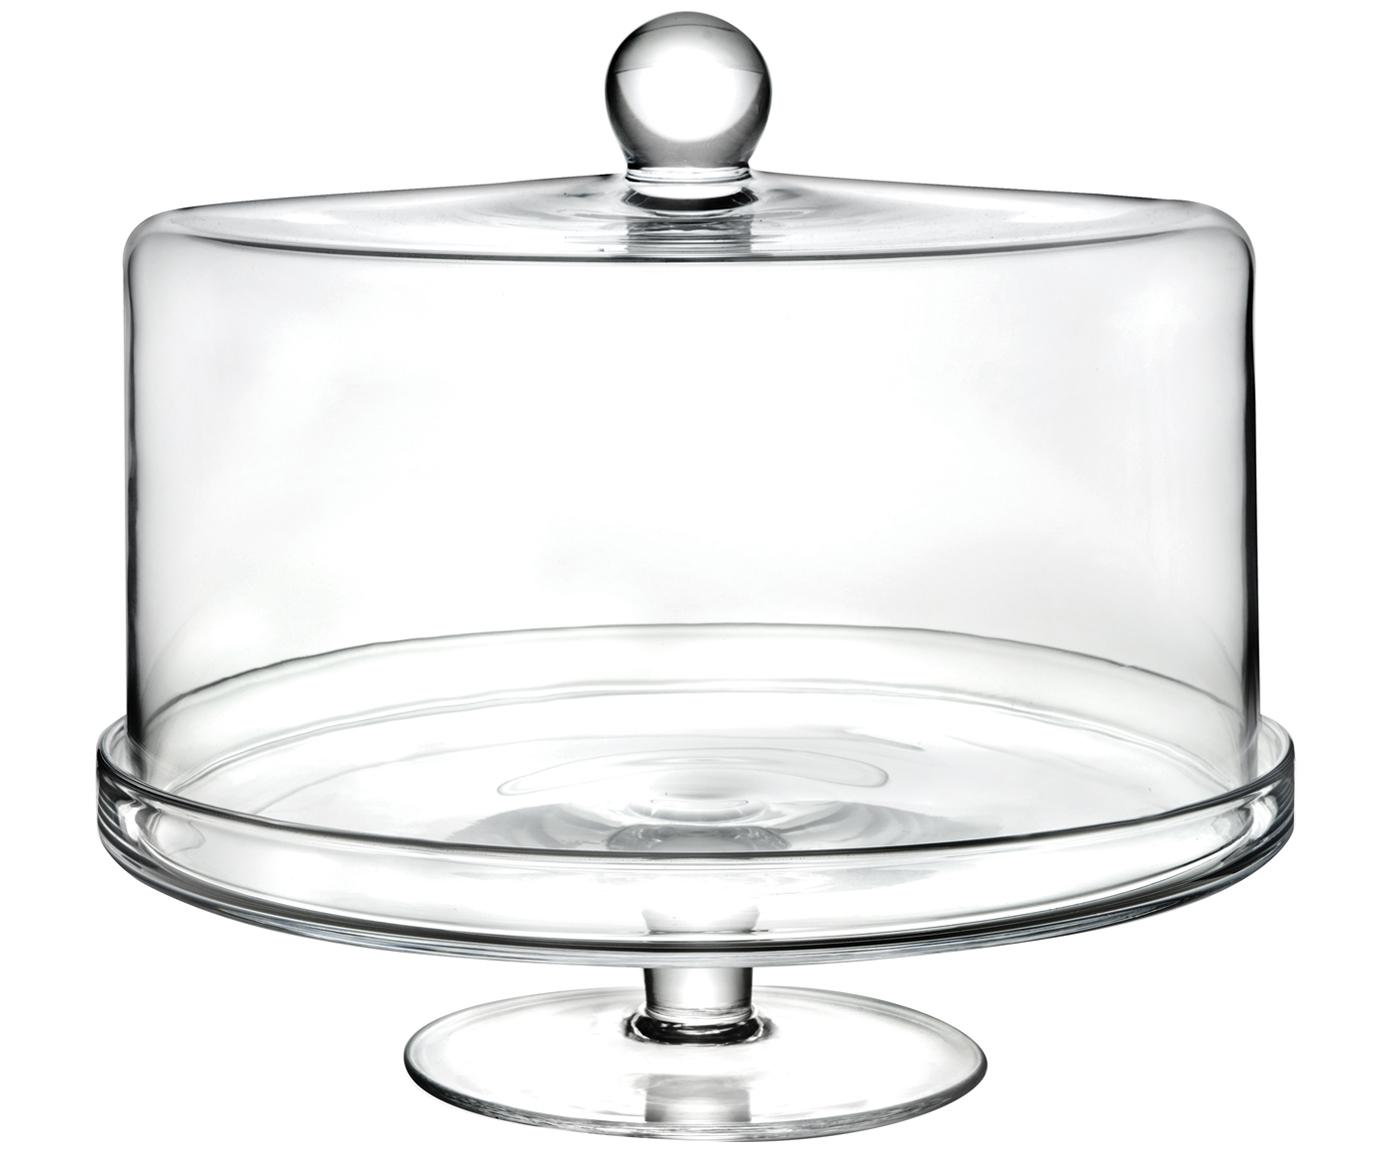 Kristalglas taartplateau Maja, Luxion kristalglas, Transparant, Ø 30 x H 25 cm